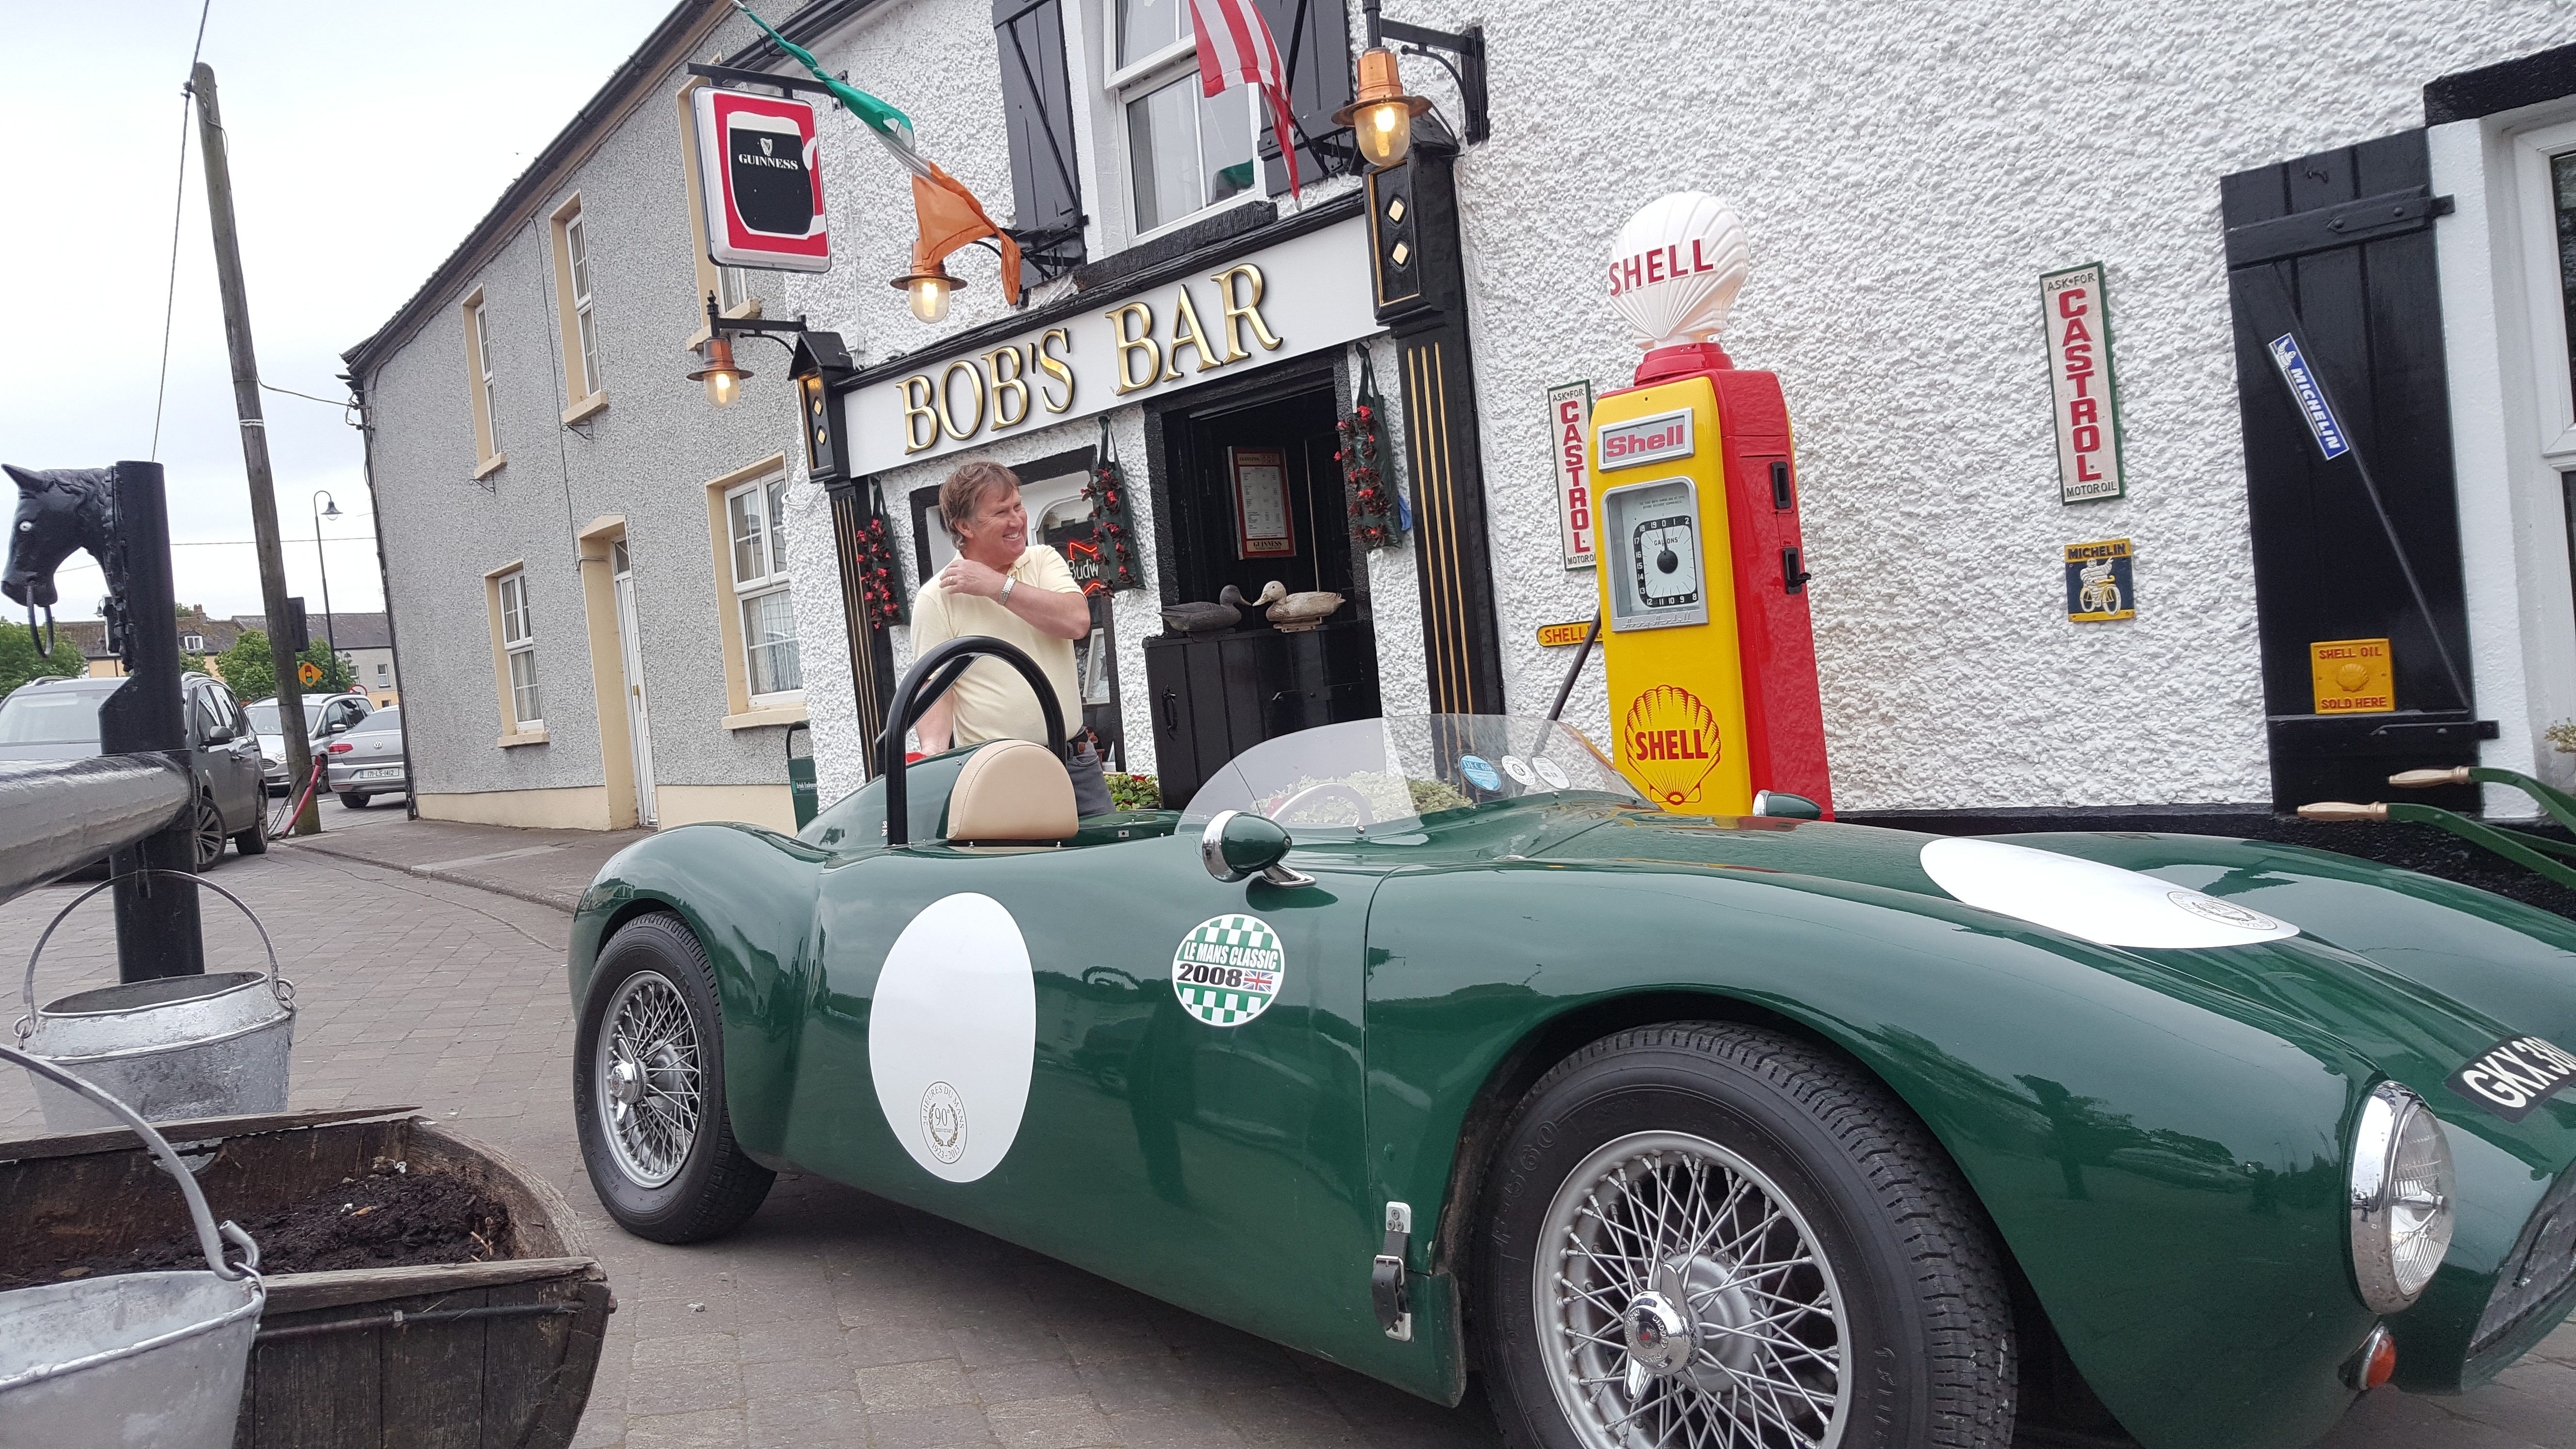 UK Restoration's Avery Hardoll 101 Petrol Pump in Shell Livery in Ireland